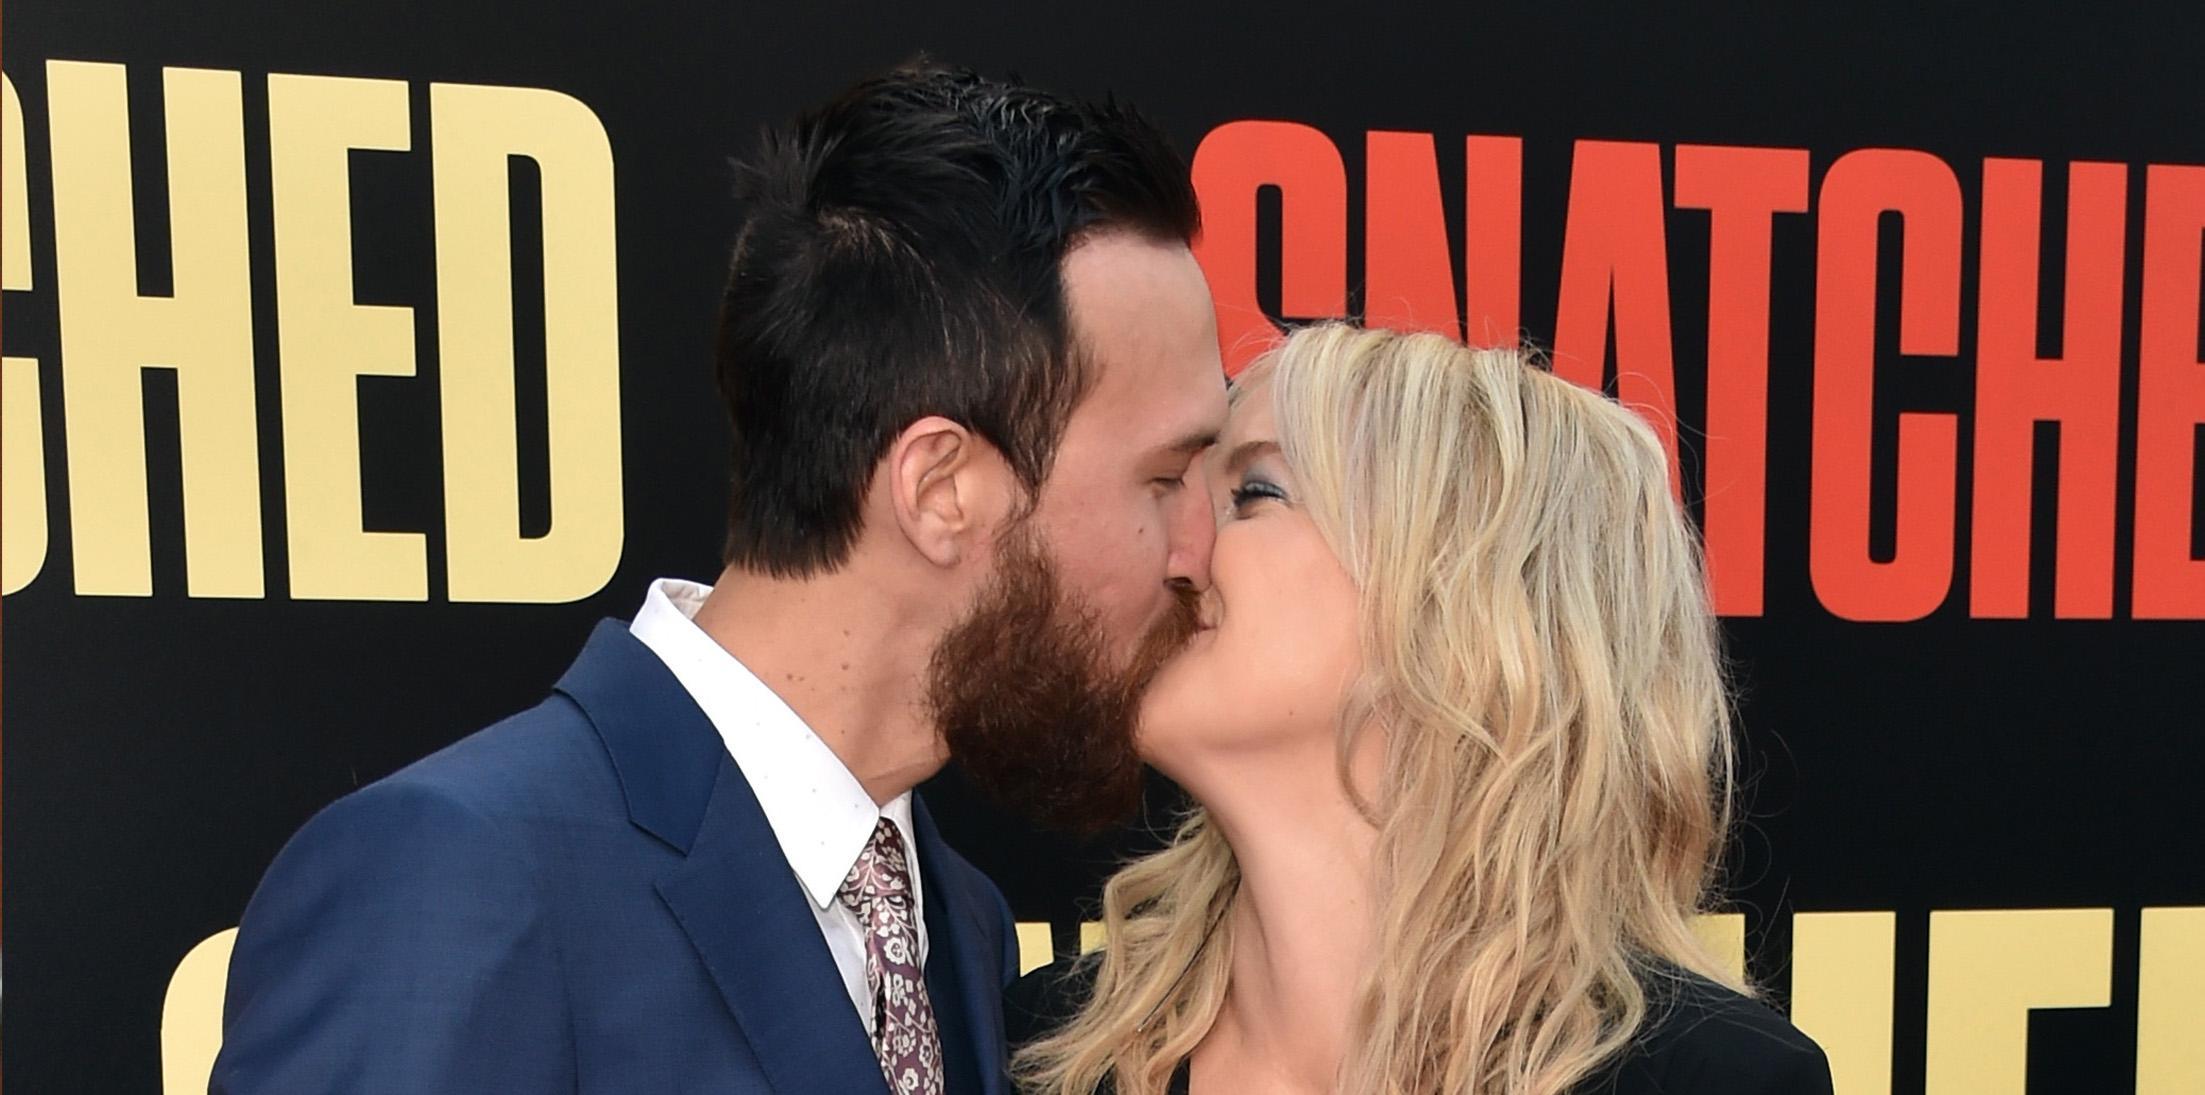 Kate hudson dating danny fujikawa feature